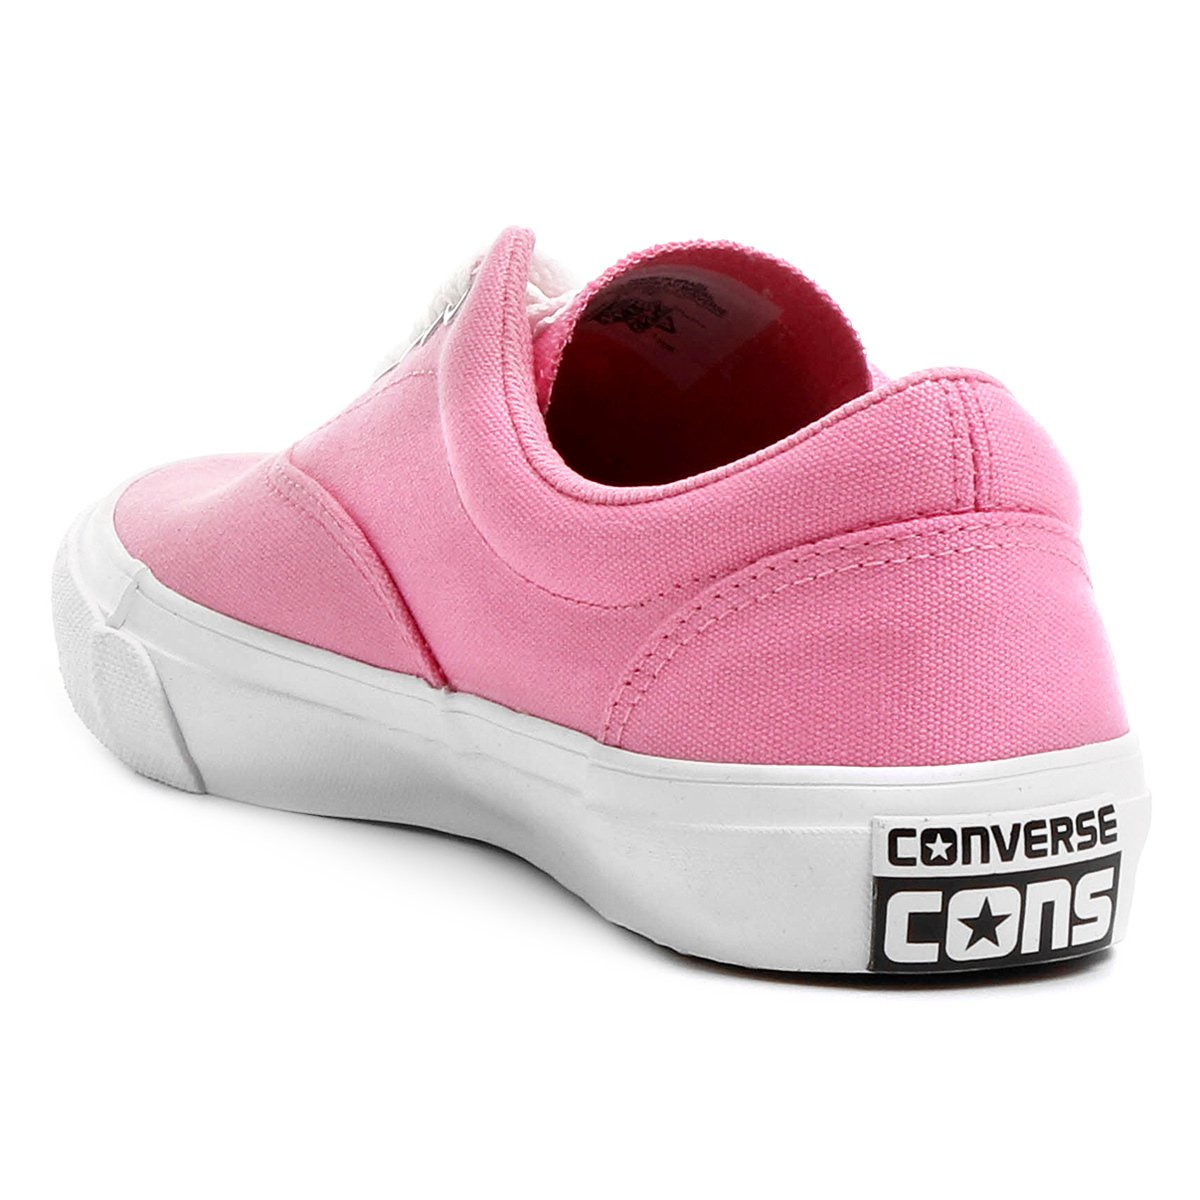 Converse Tênis Tênis Converse Branco Cvo e Rosa Skidgrip ETfx8Hxwq